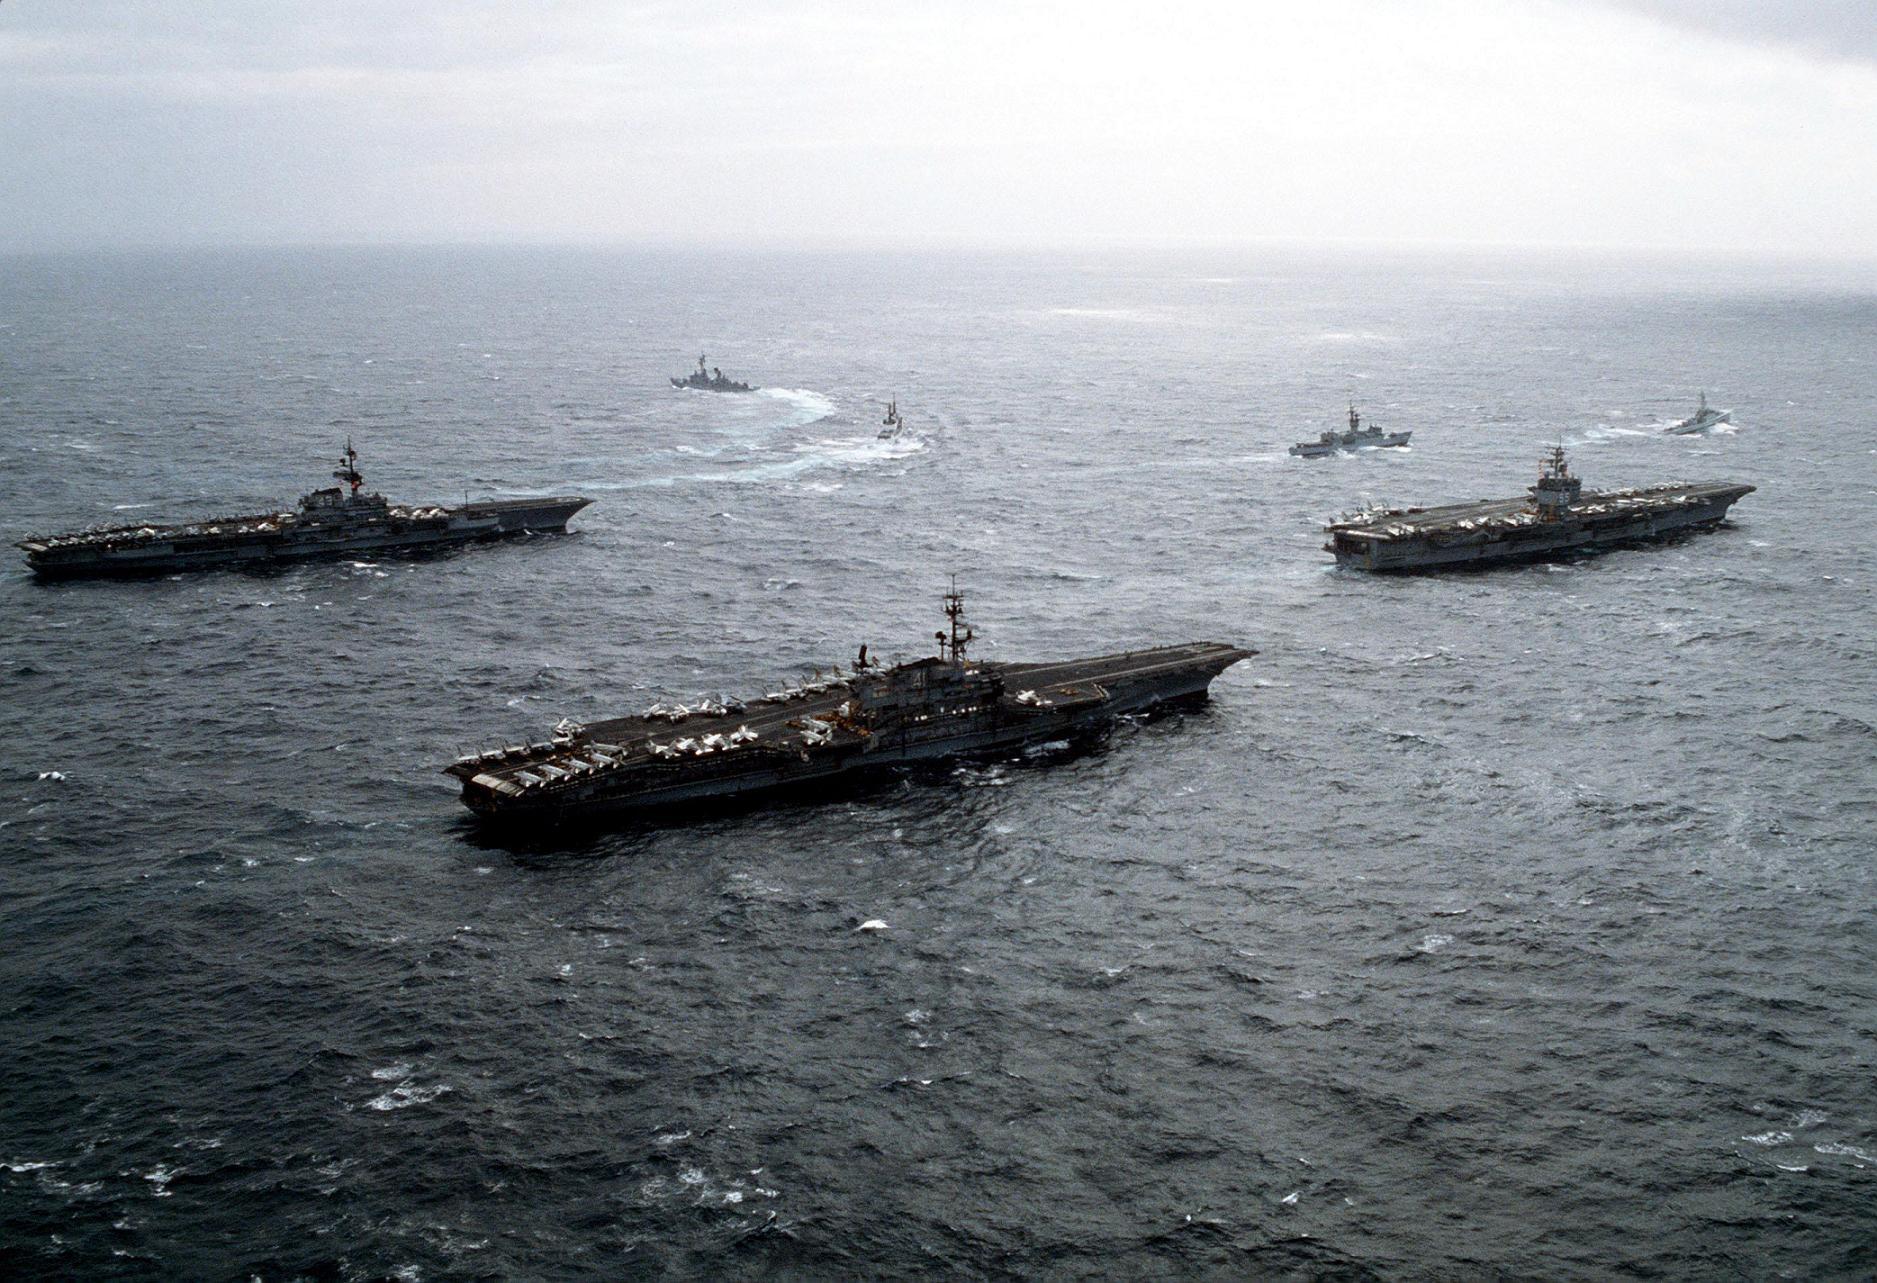 Sea Cv Coral Enterprise Cv 65 43 Midway Uss 41 Uss Cv Uss